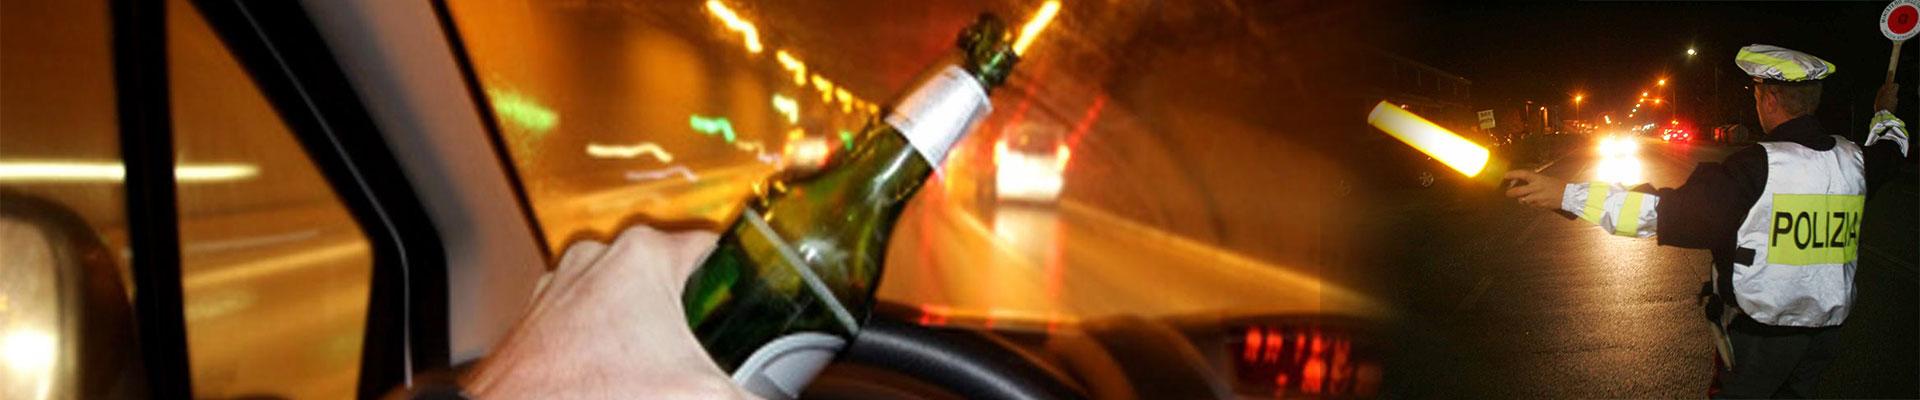 Avvocato Firenze Alcol Test